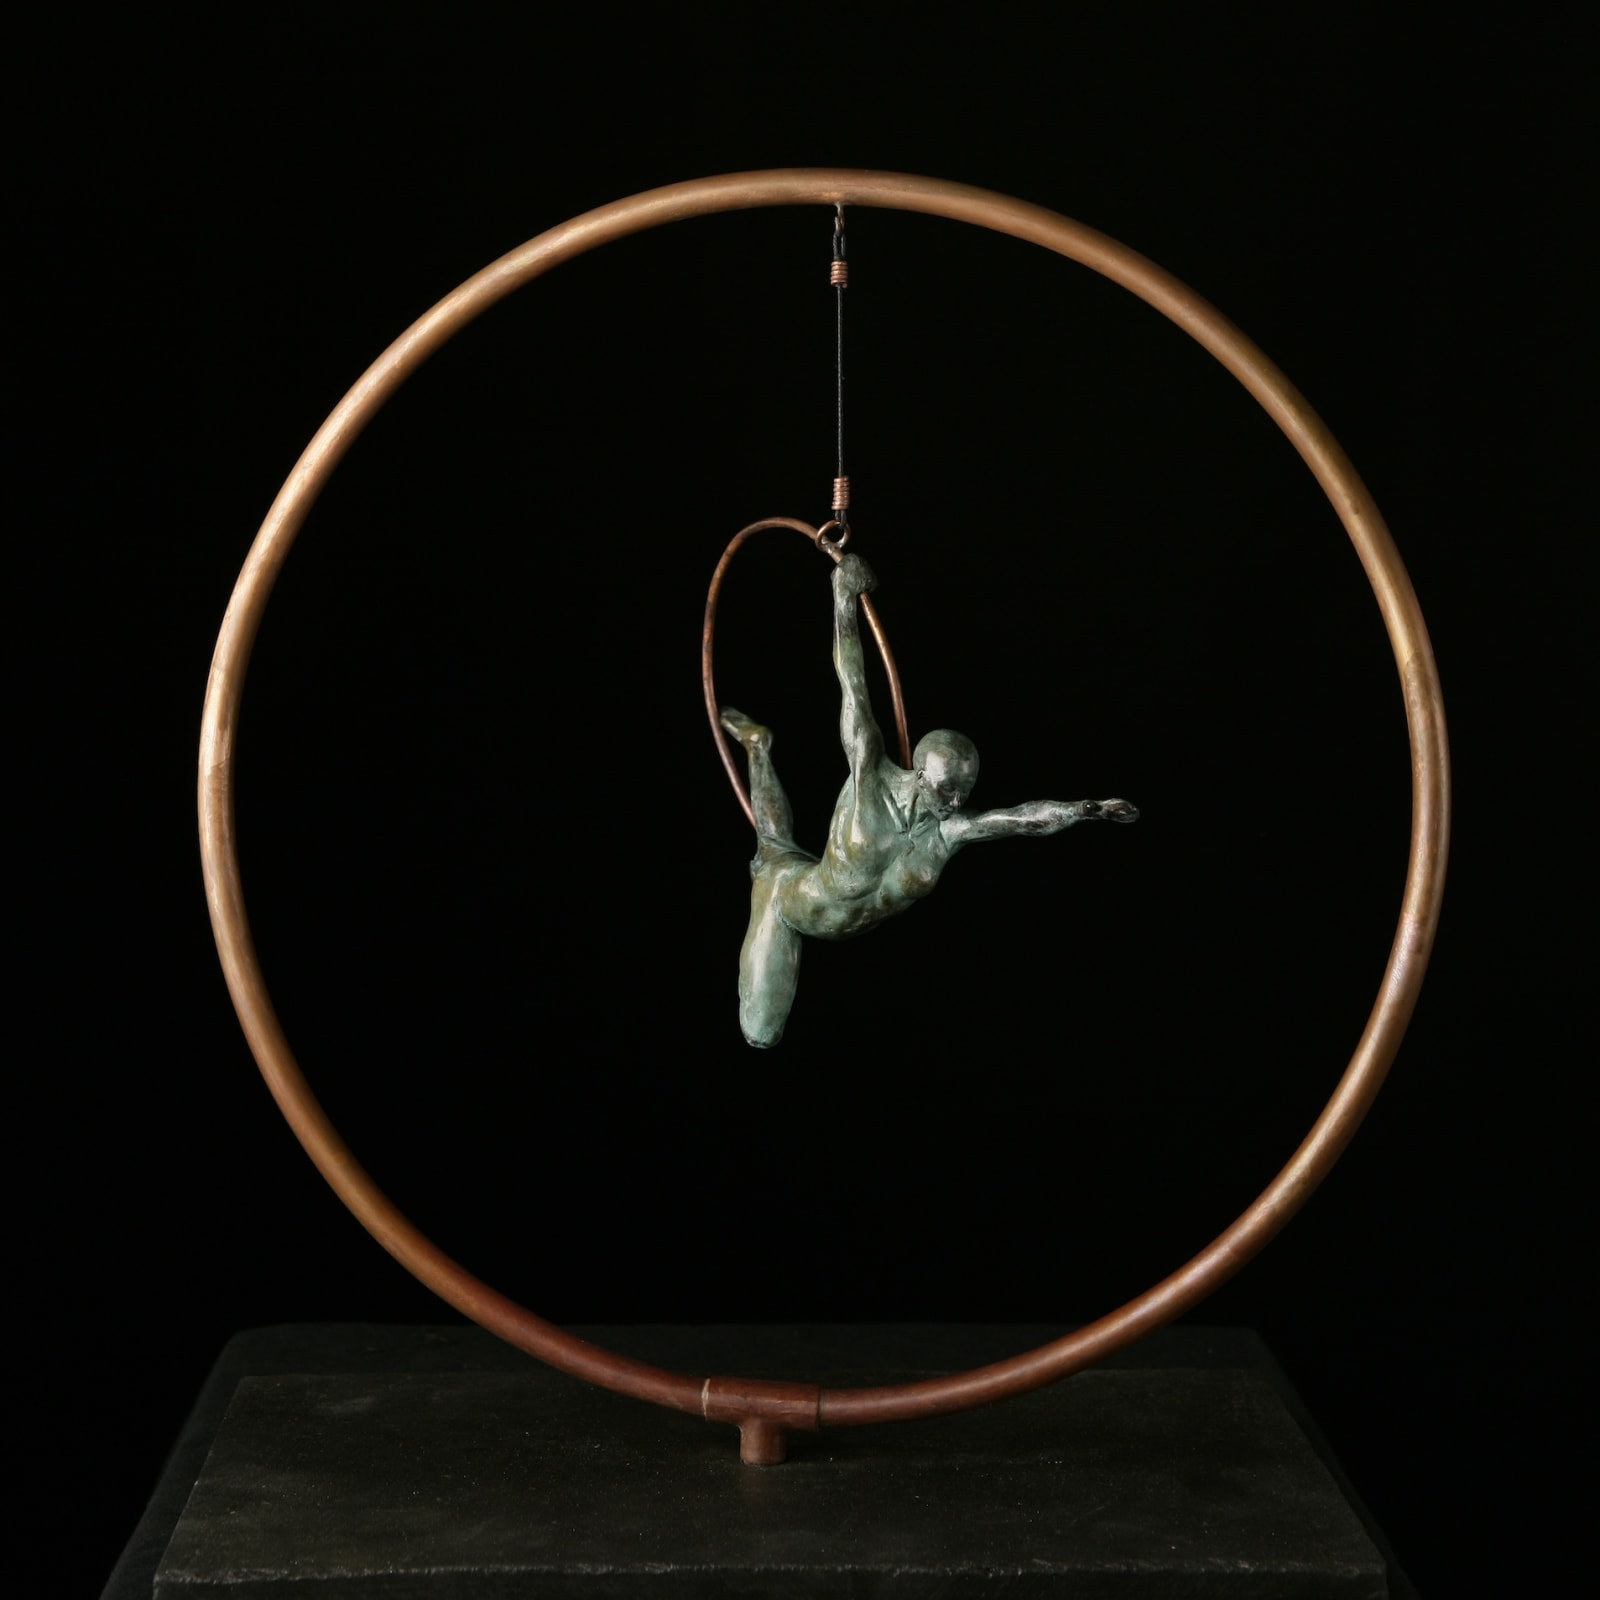 Brendon Murless, Rings, 2019